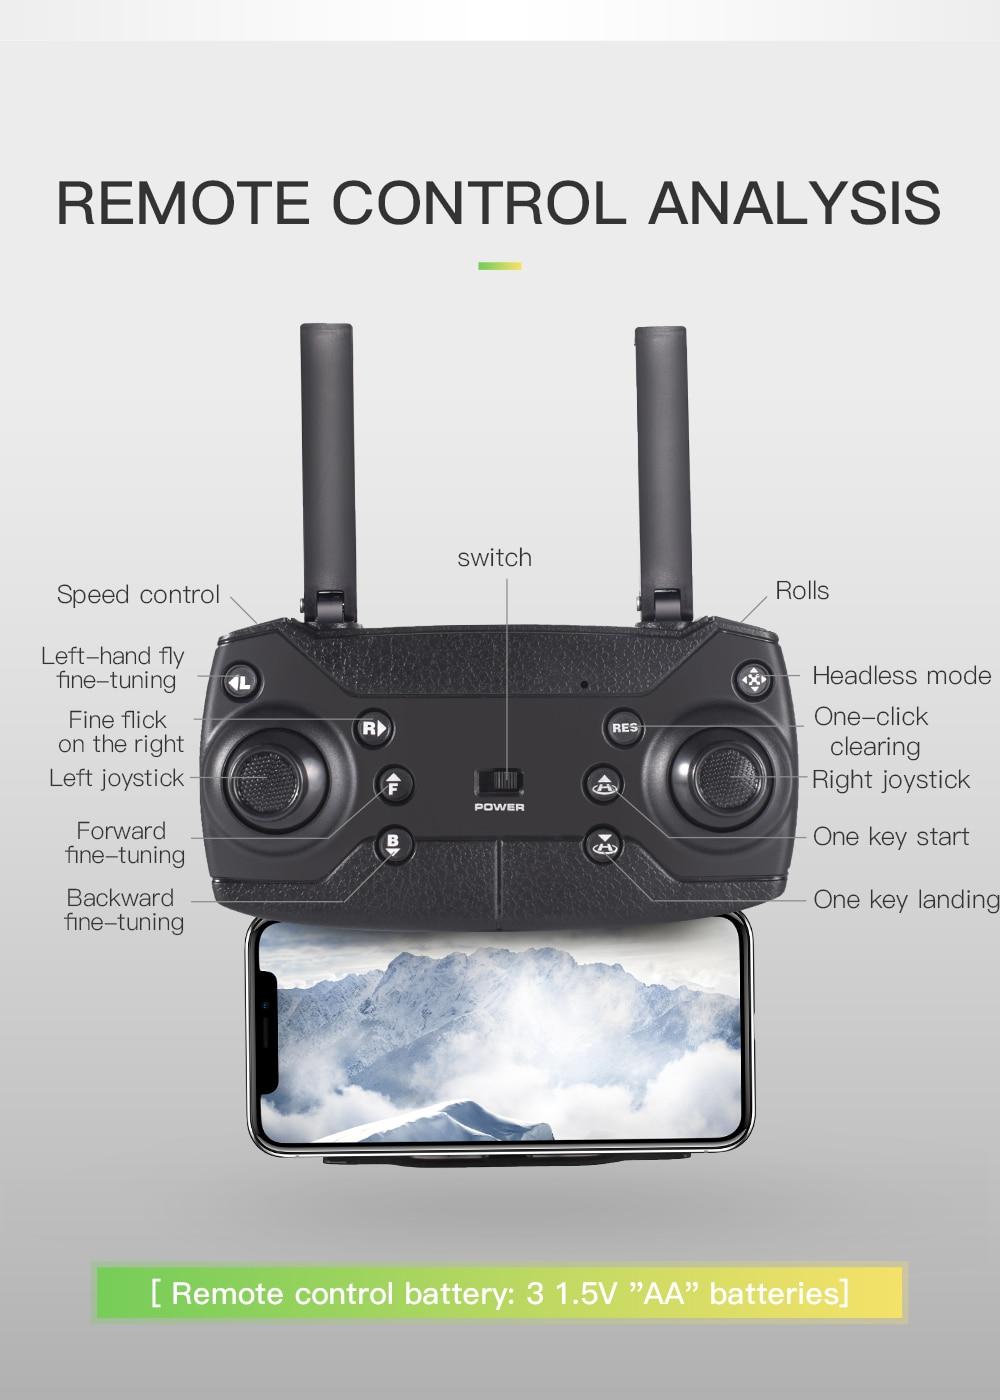 KF600 720P Camera WiFi FPV RC Quadcopter Drone Optical Flow Positionin